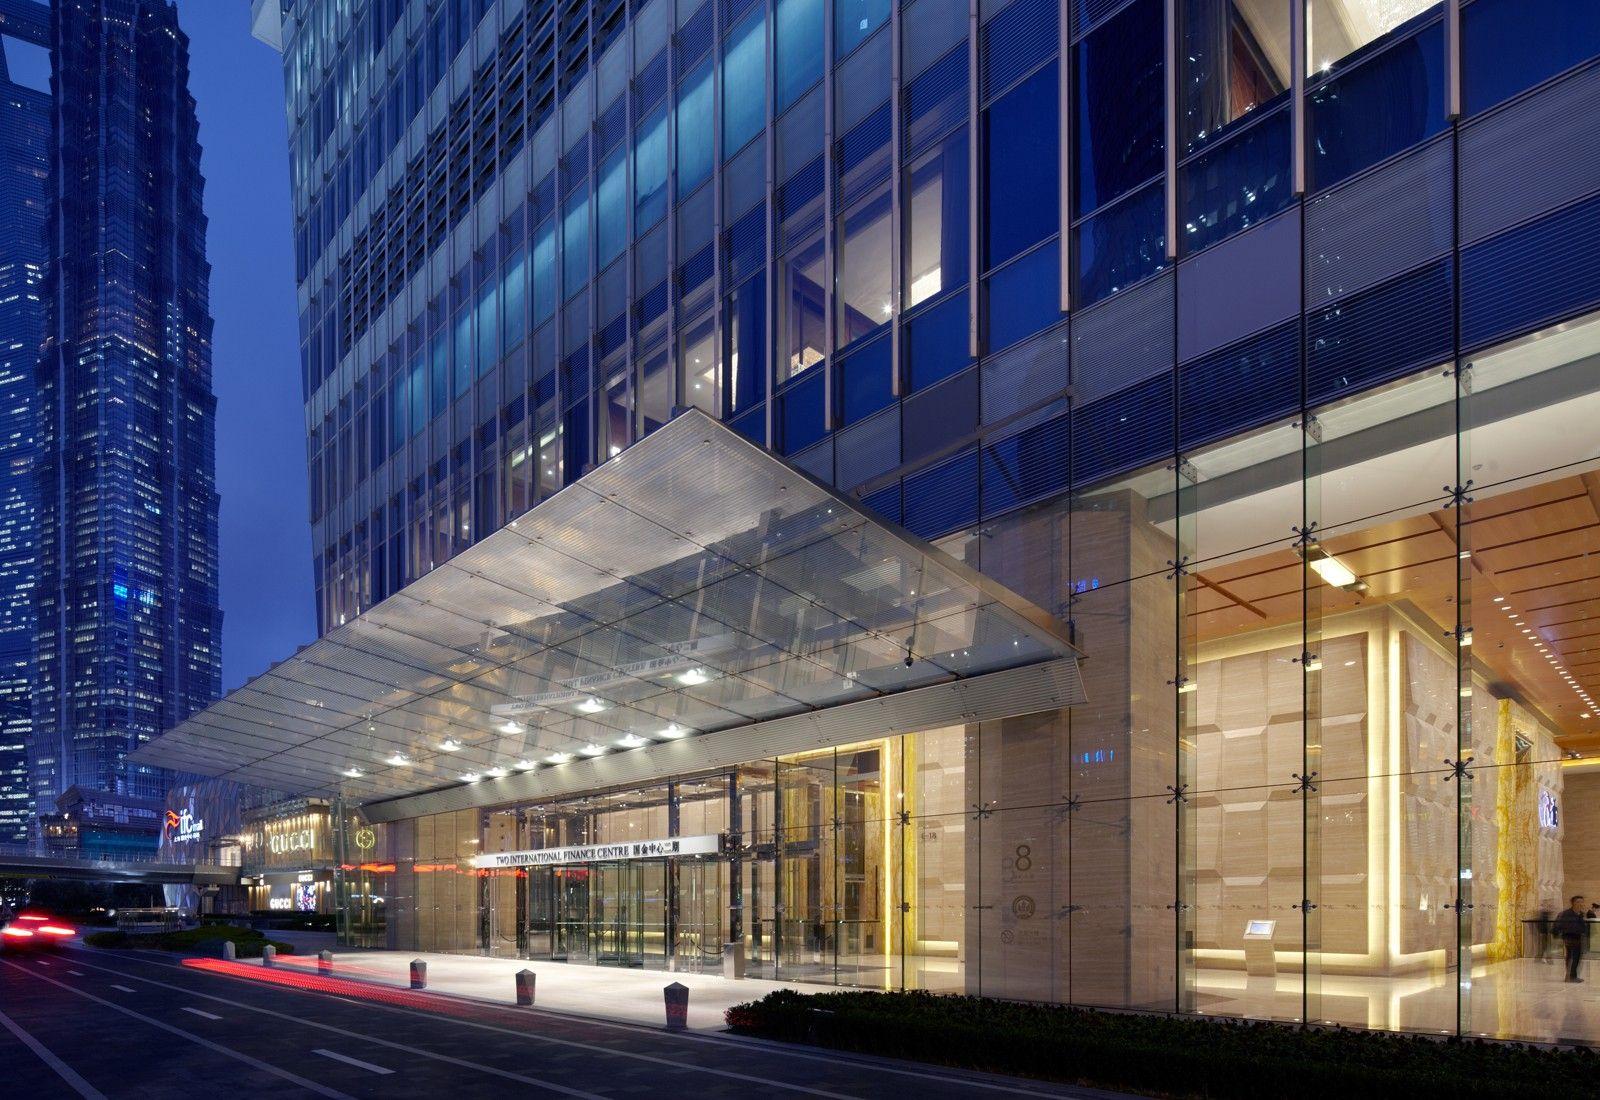 Shanghai ifc canopy pinterest shanghai canopy and for Building canopy design